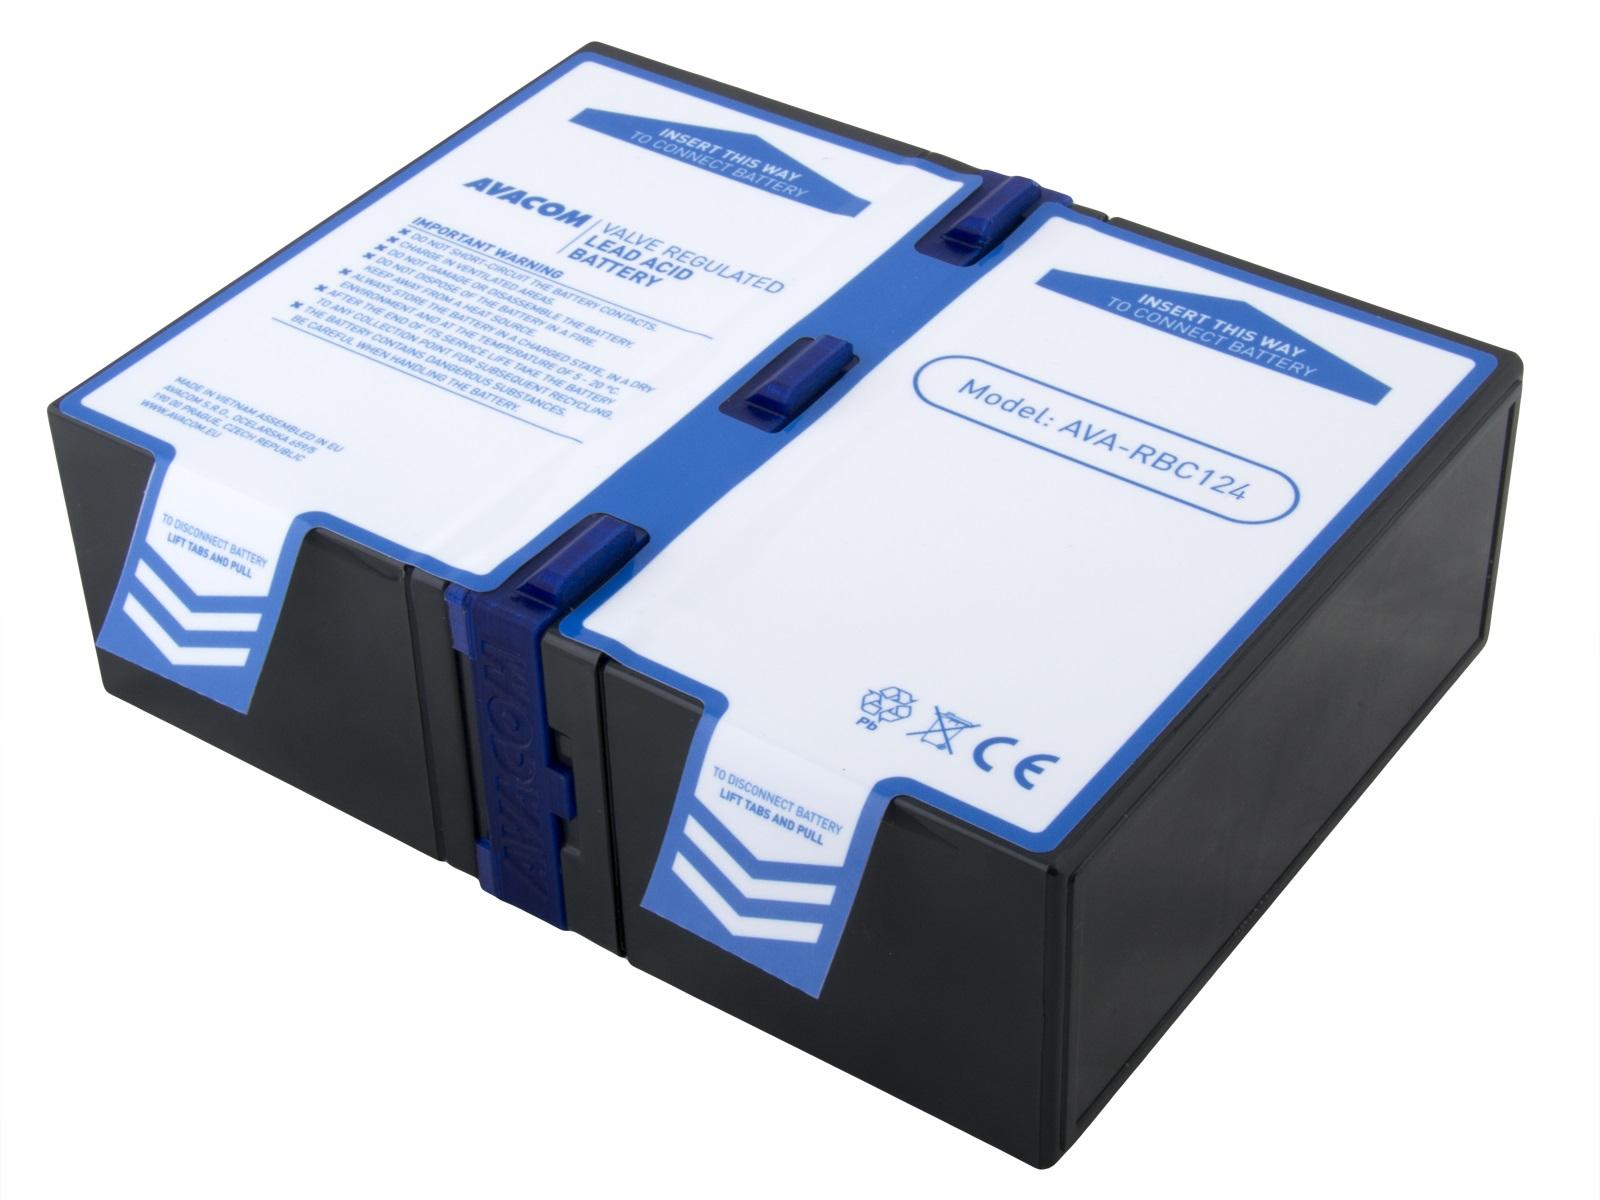 AVACOM náhrada za RBC124 - baterie pro UPS; AVA-RBC124